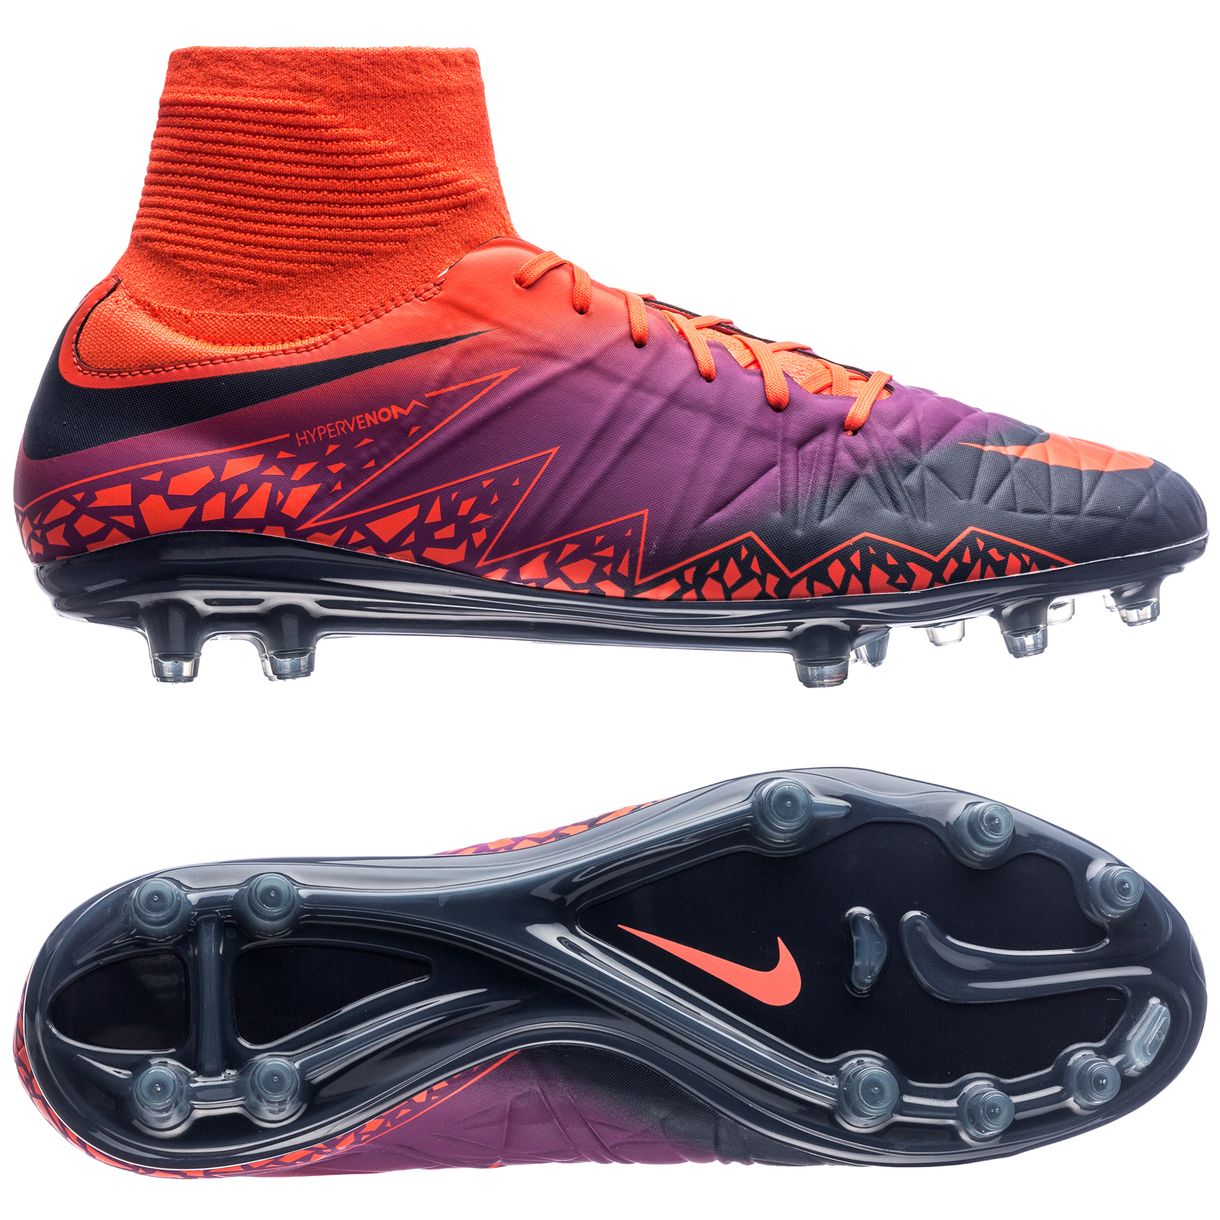 on sale 8e1b6 a981d Nike Voetbalschoenen - Hypervenom Phatal II